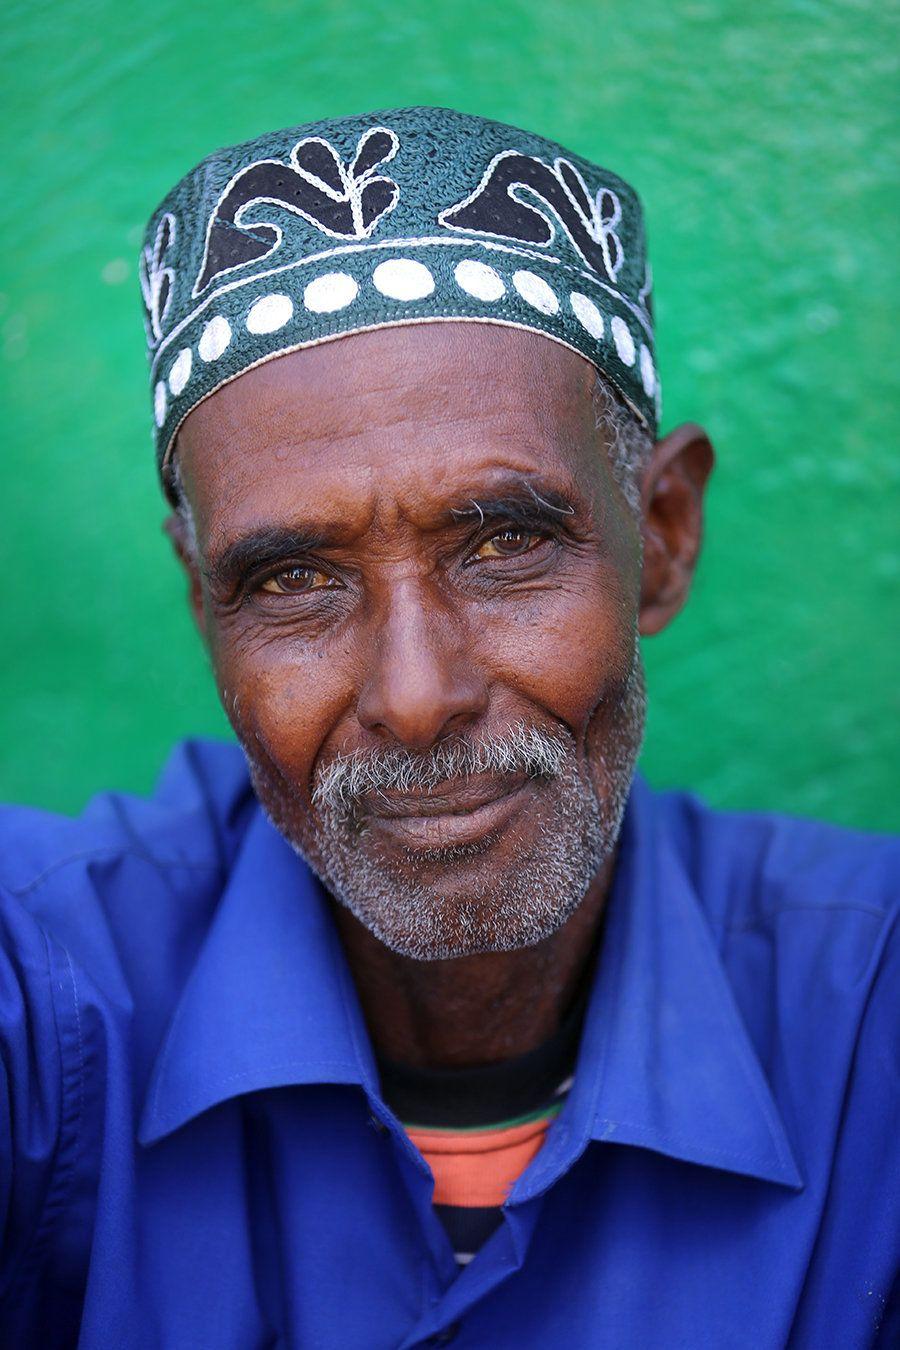 Hargeisa, Self-declared Somaliland State